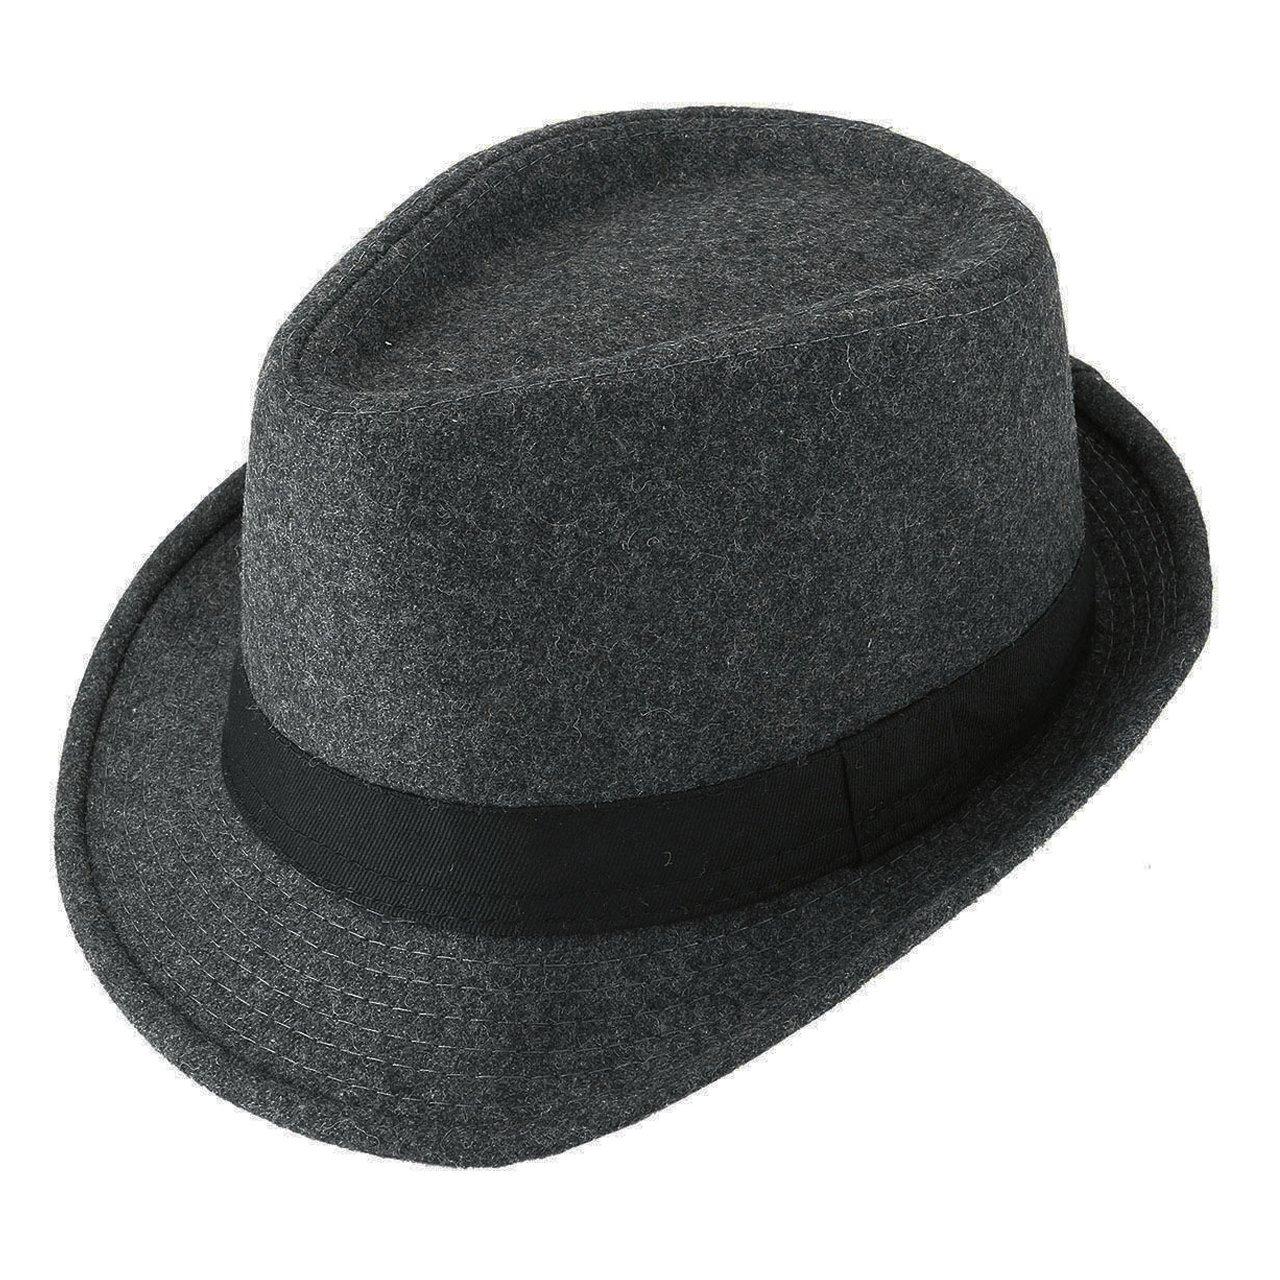 Unisex Classic Manhattan Fedora Hat Black Band Fashion Casual Jazz Wool Cap (Grey)